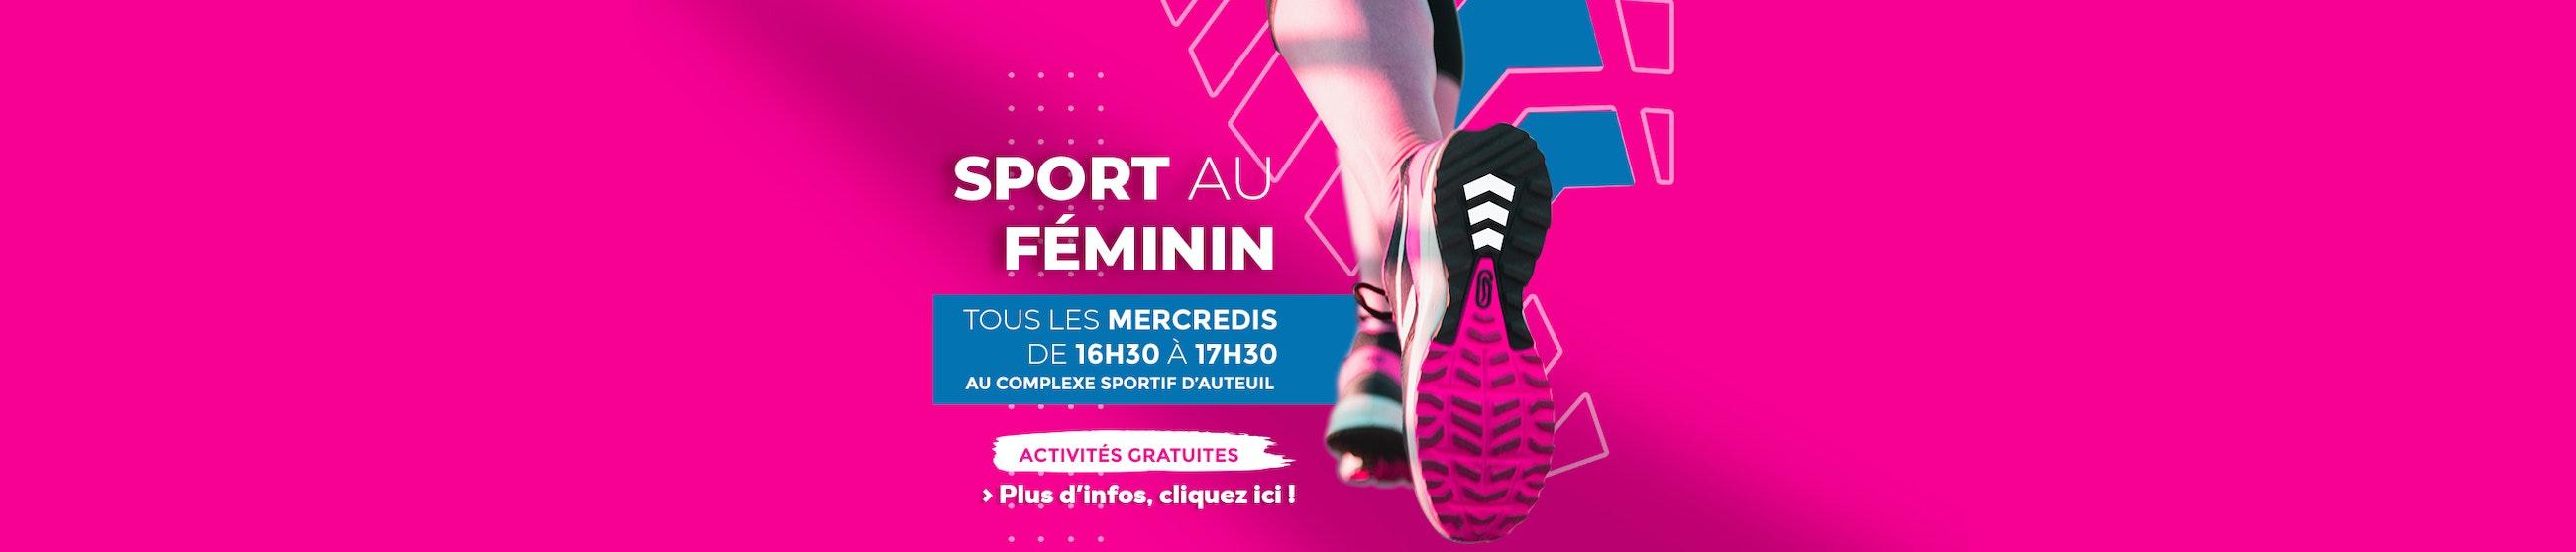 1620337744 slidersiteinternet2800x600 sport au feminin 2021